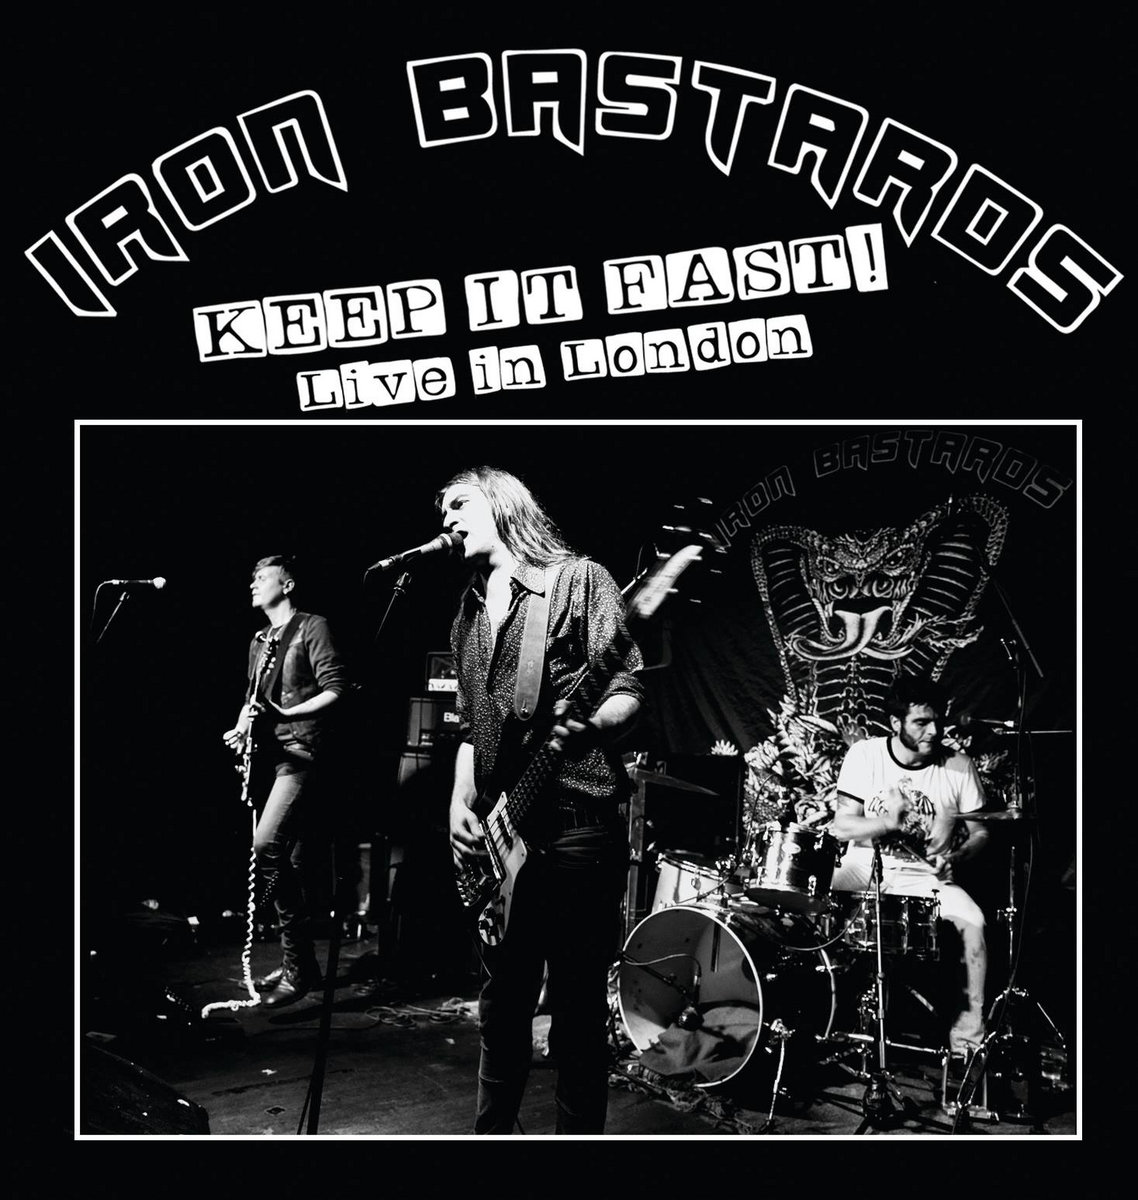 www.facebook.com/ironbastardsrocknroll